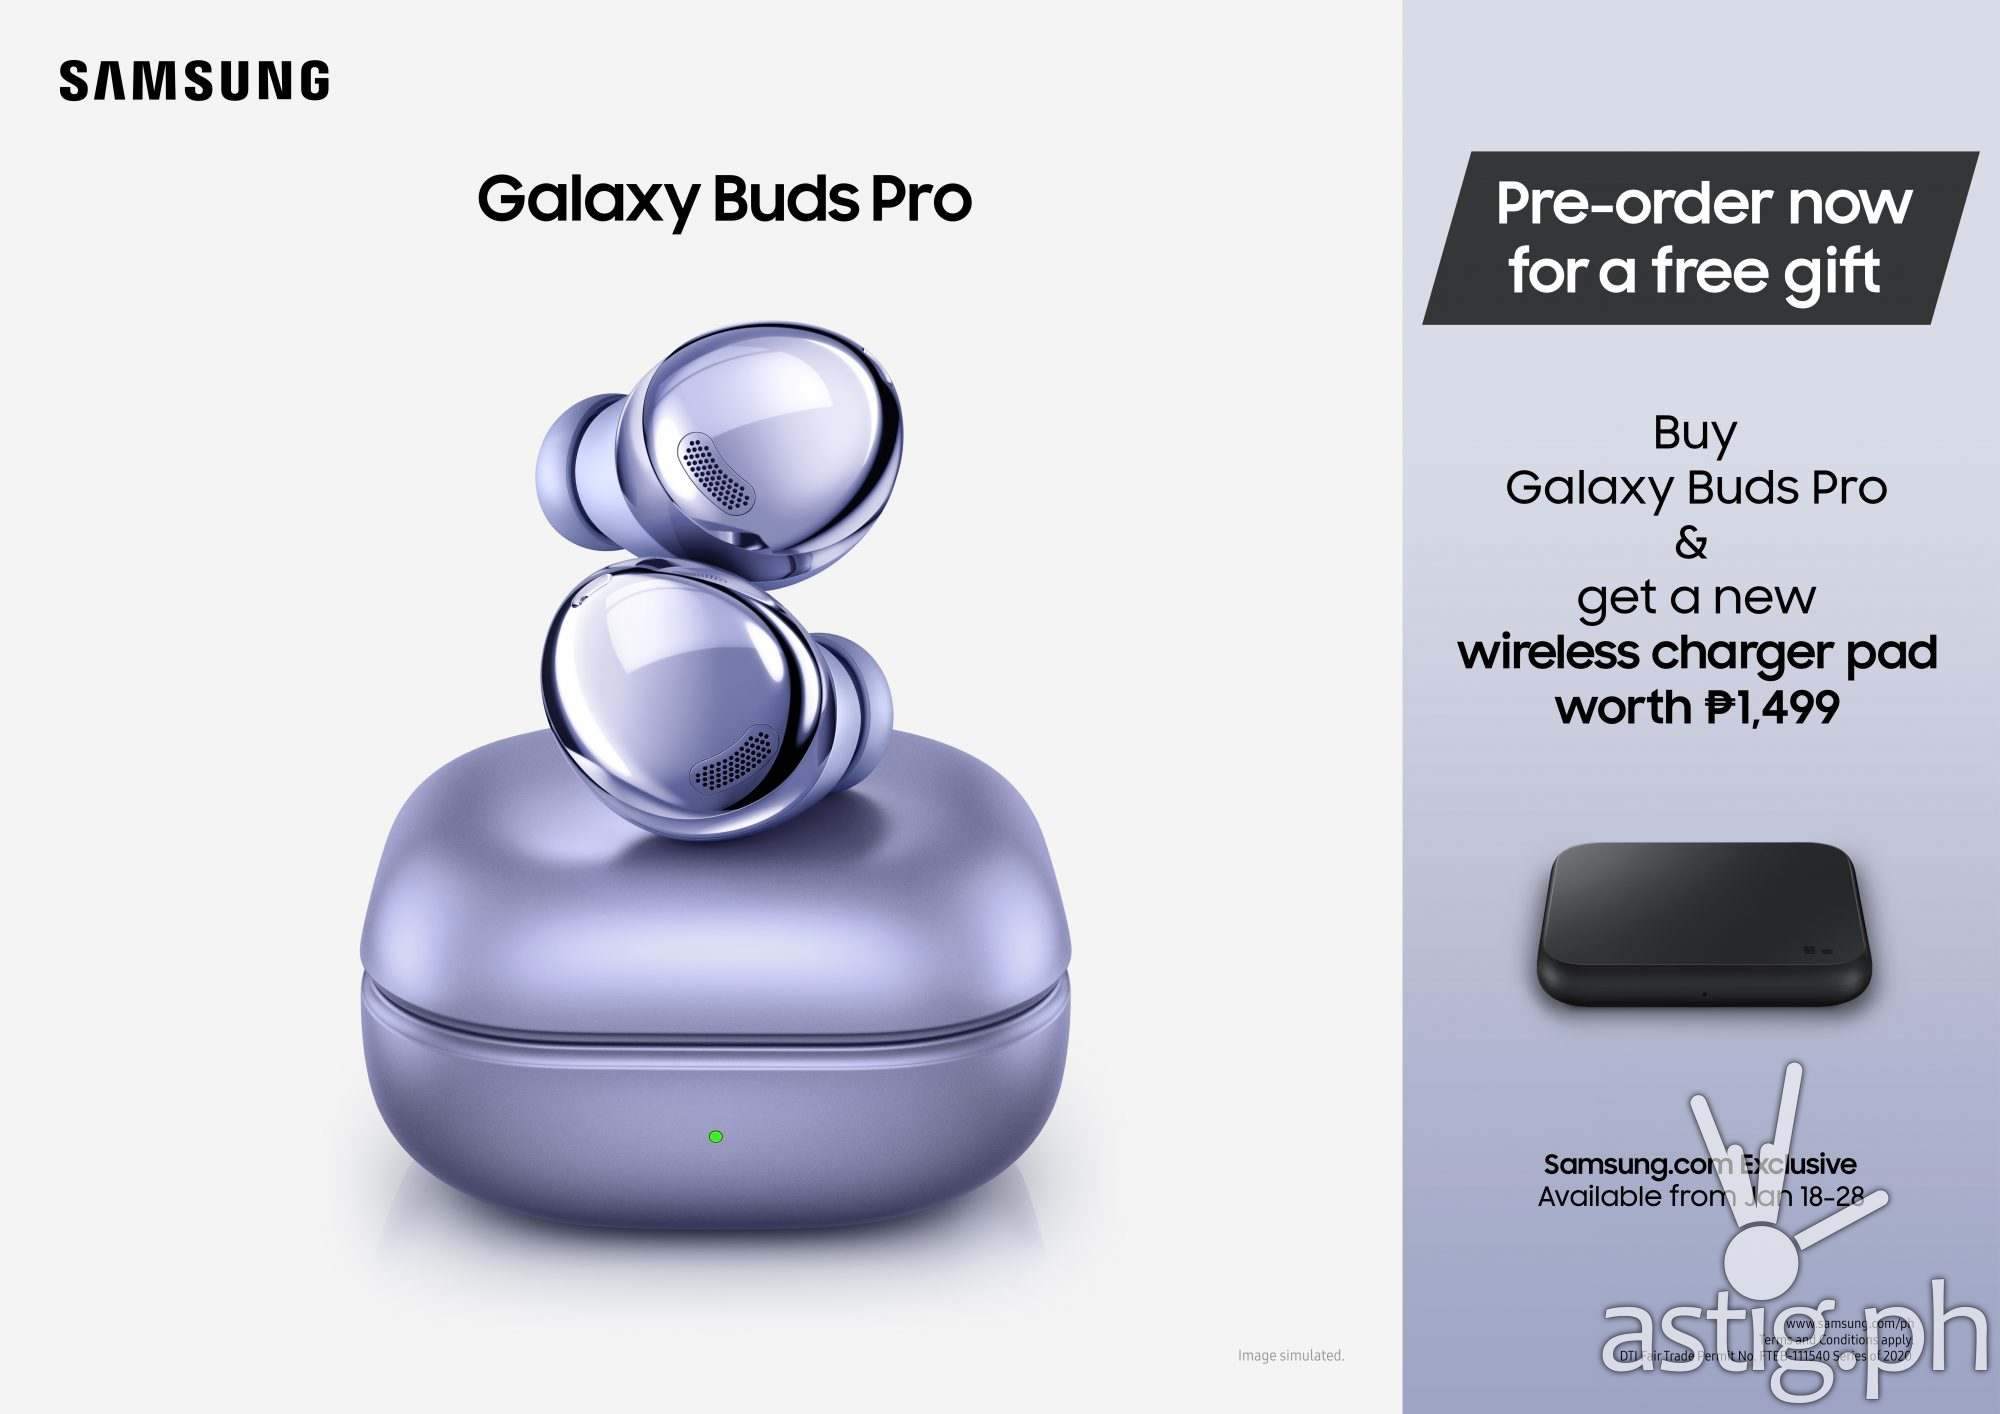 Galaxy Buds Pro Preorder price (Philippines)